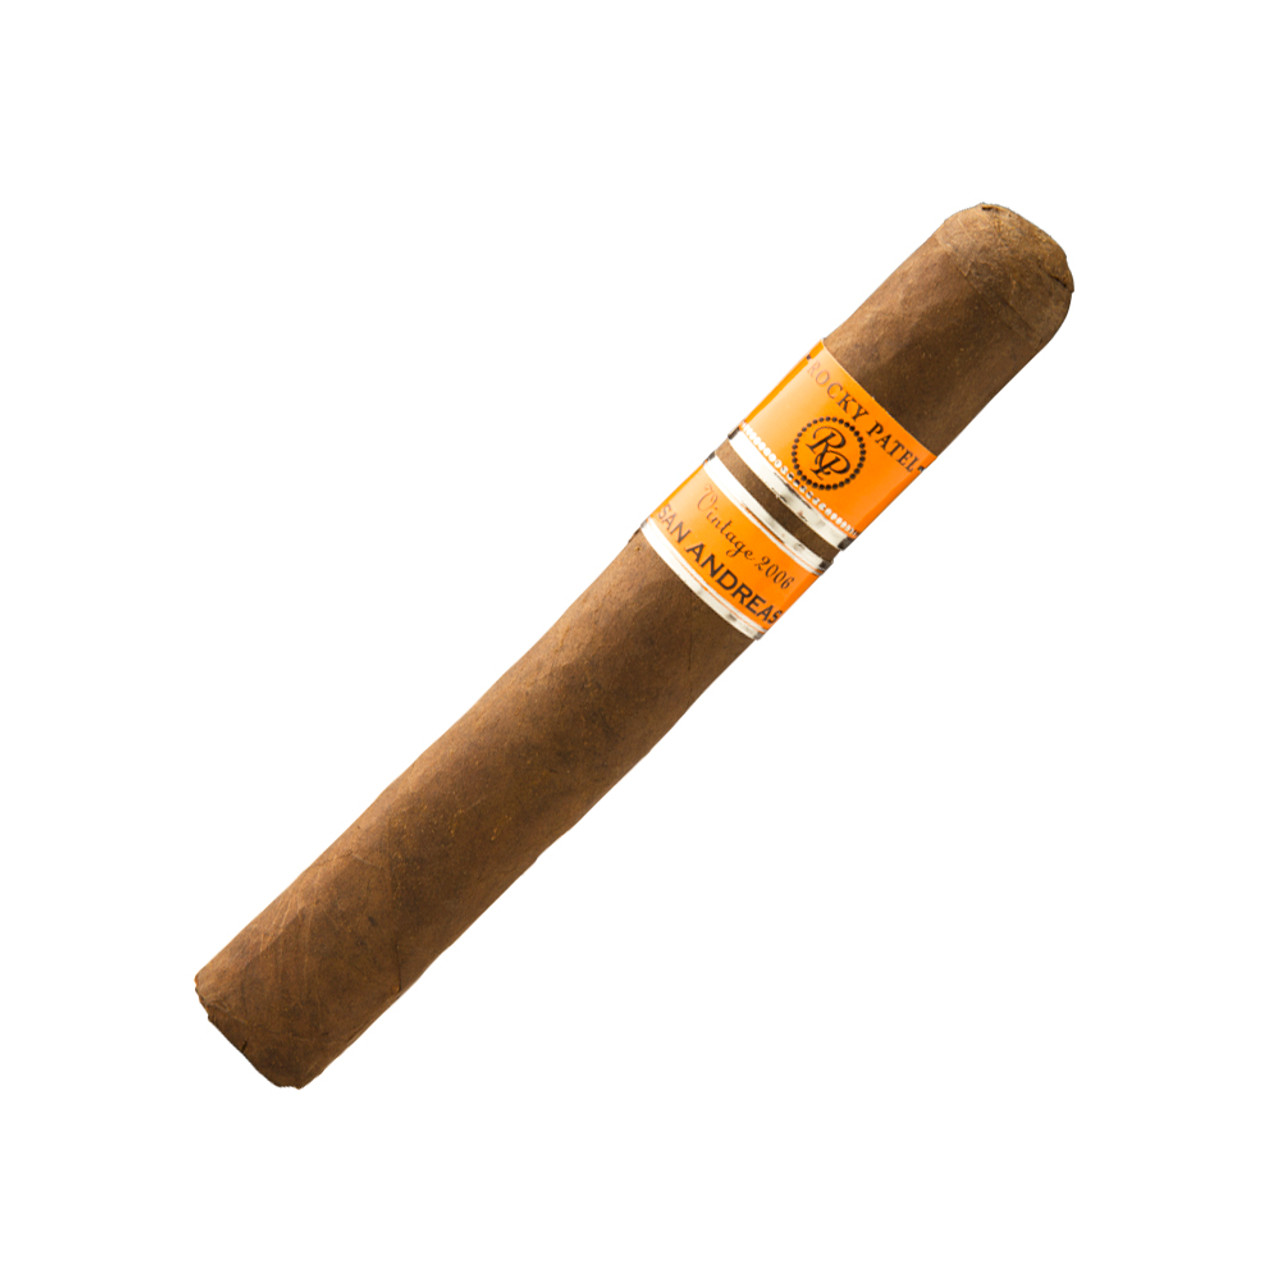 Rocky Patel Vintage 2006 San Andreas Toro Cigars - 6.5 x 52 (Box of 20)